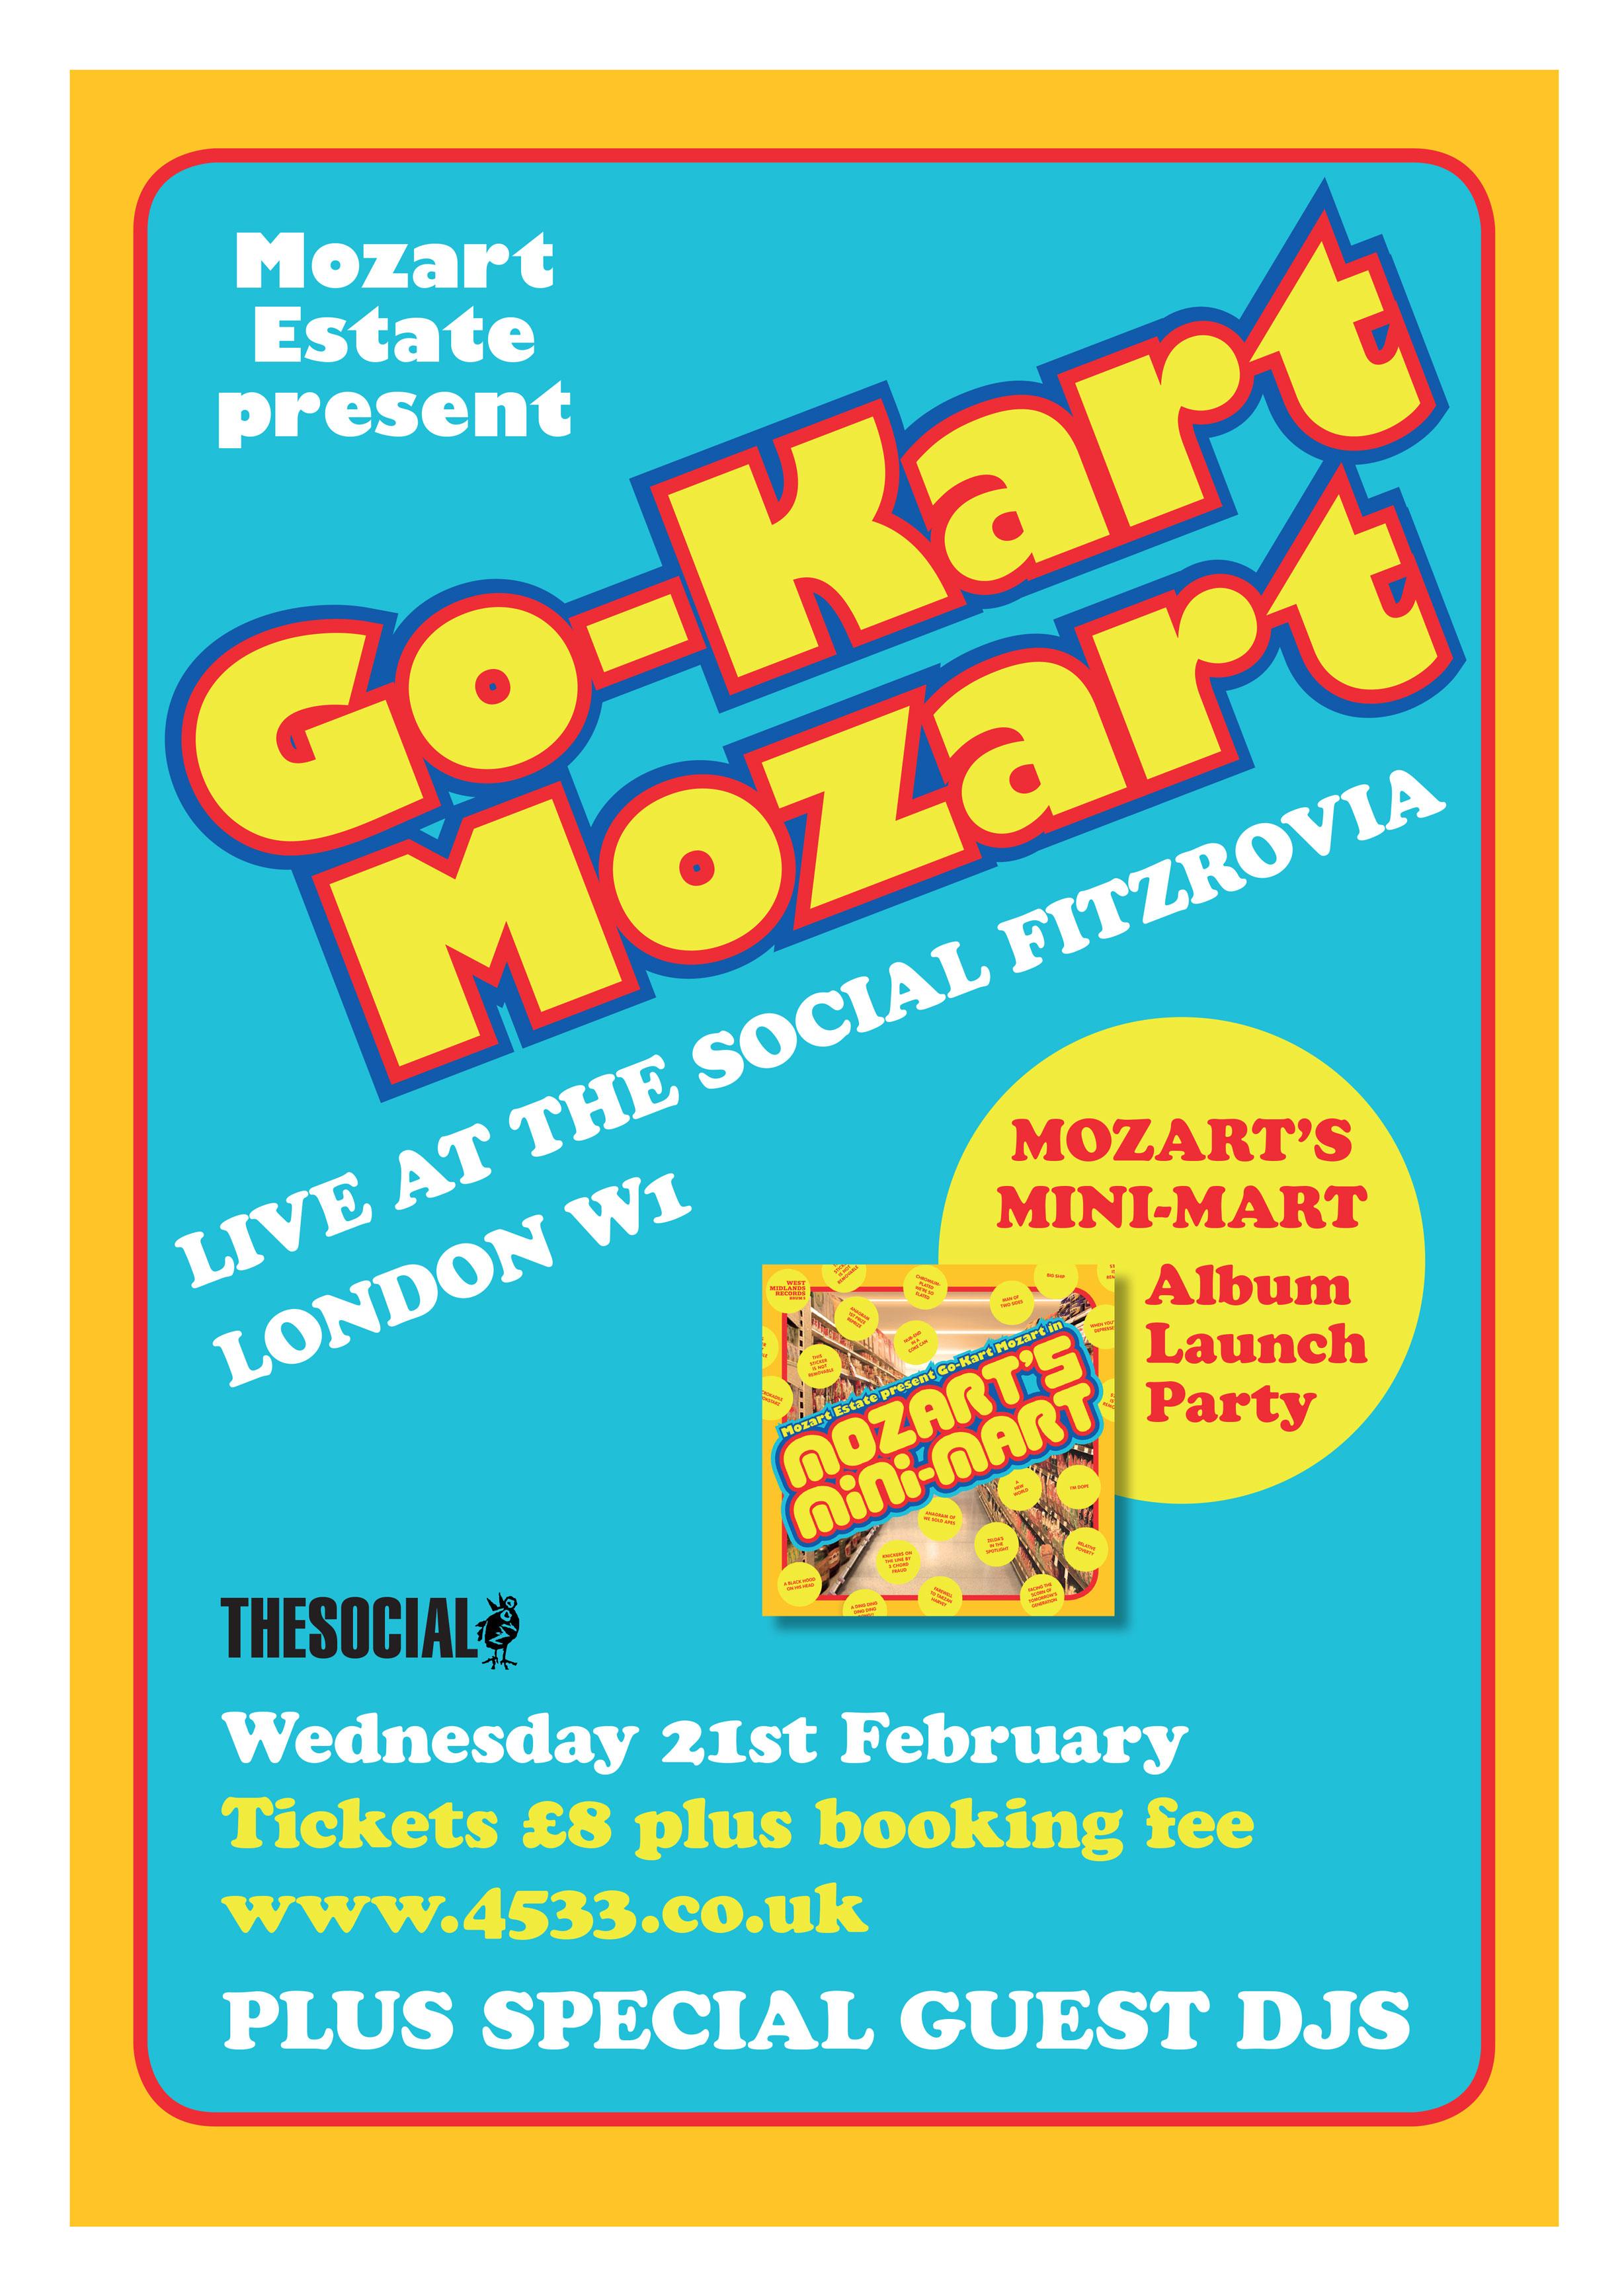 See Go Kart Mozart Play Live At The Mozarts Mini Mart Album Launch